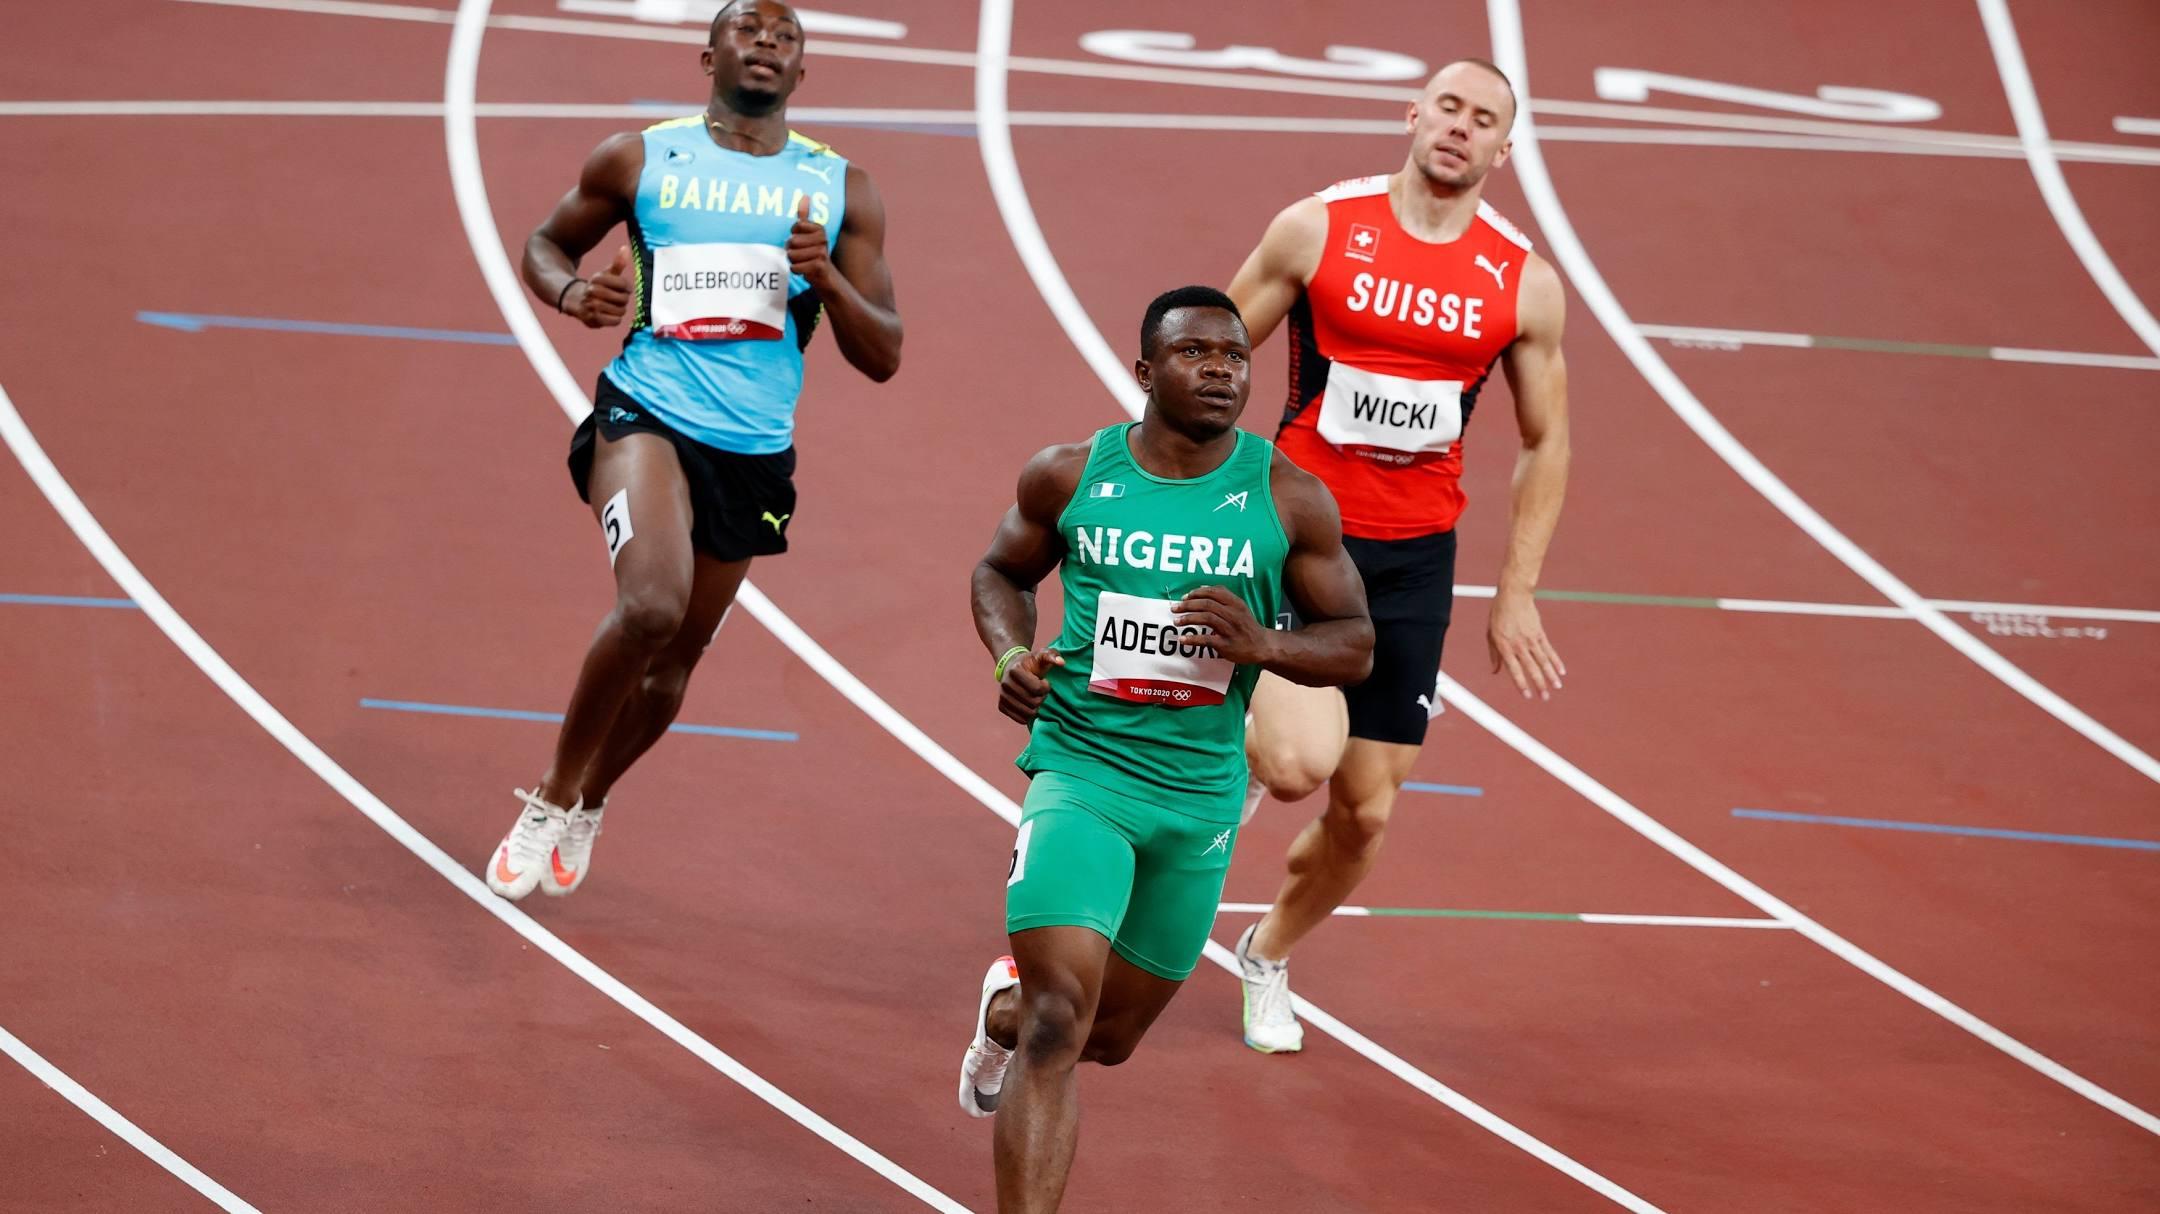 Adegoke wins 100m Heat 2, qualifies for Olympic semis ahead of Bromell